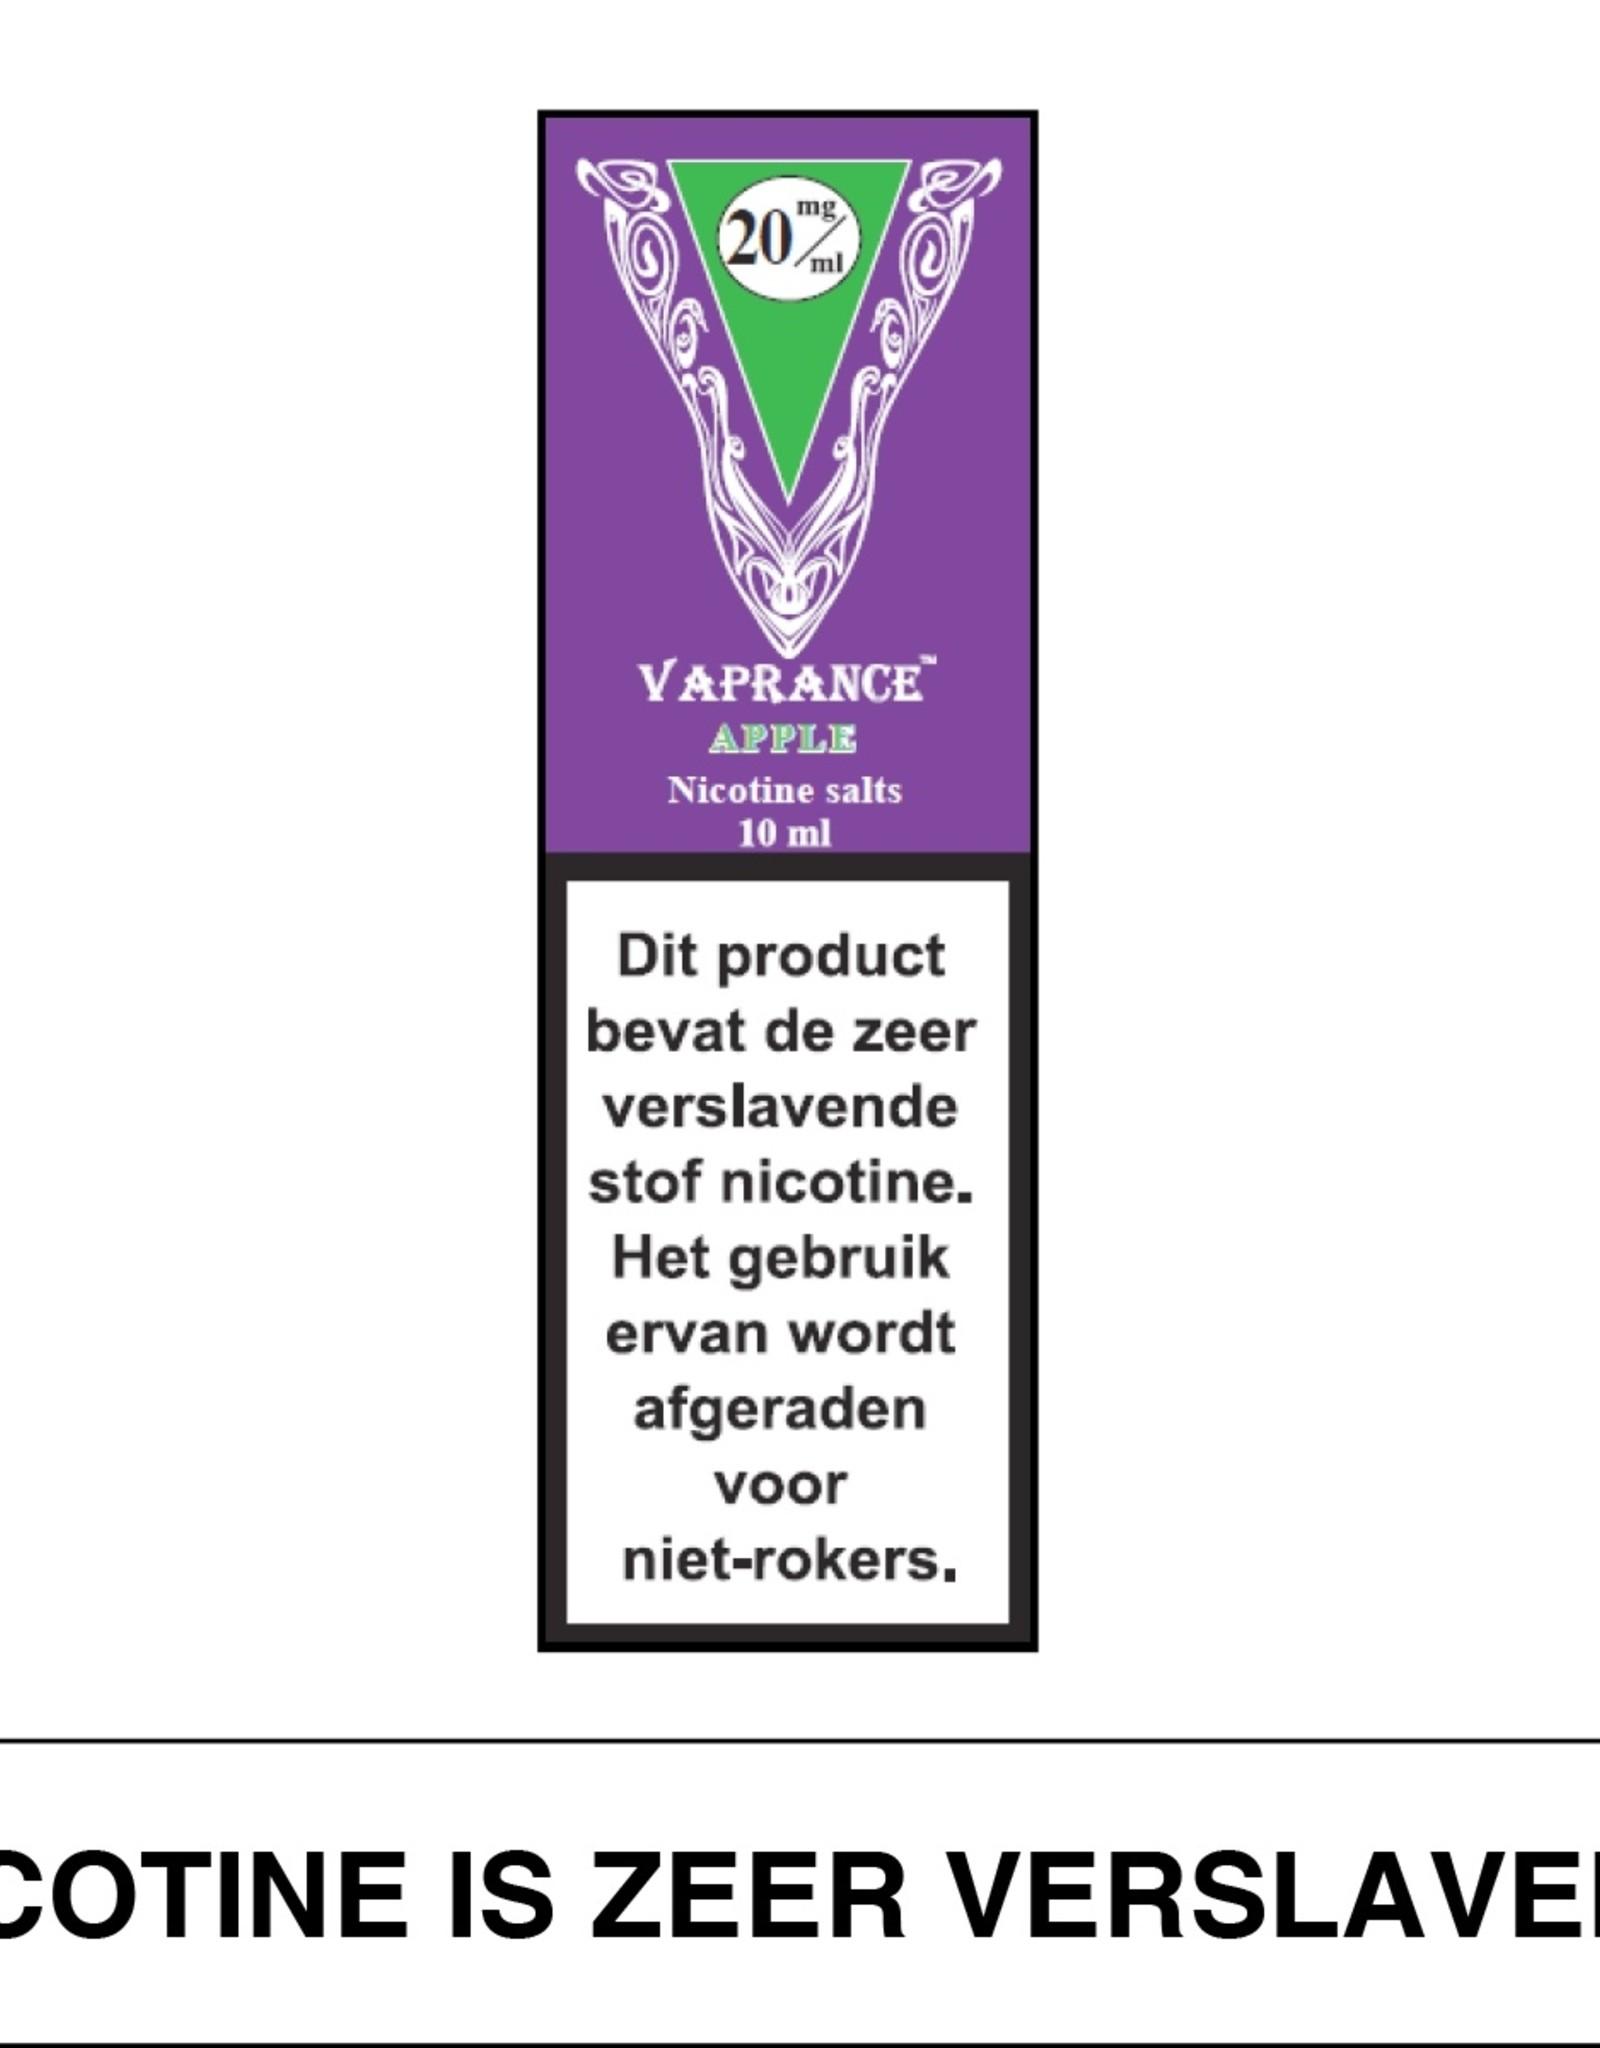 Vaprance Vaprance Purple Label E-liquid Apple 20 mg Nicotinezout